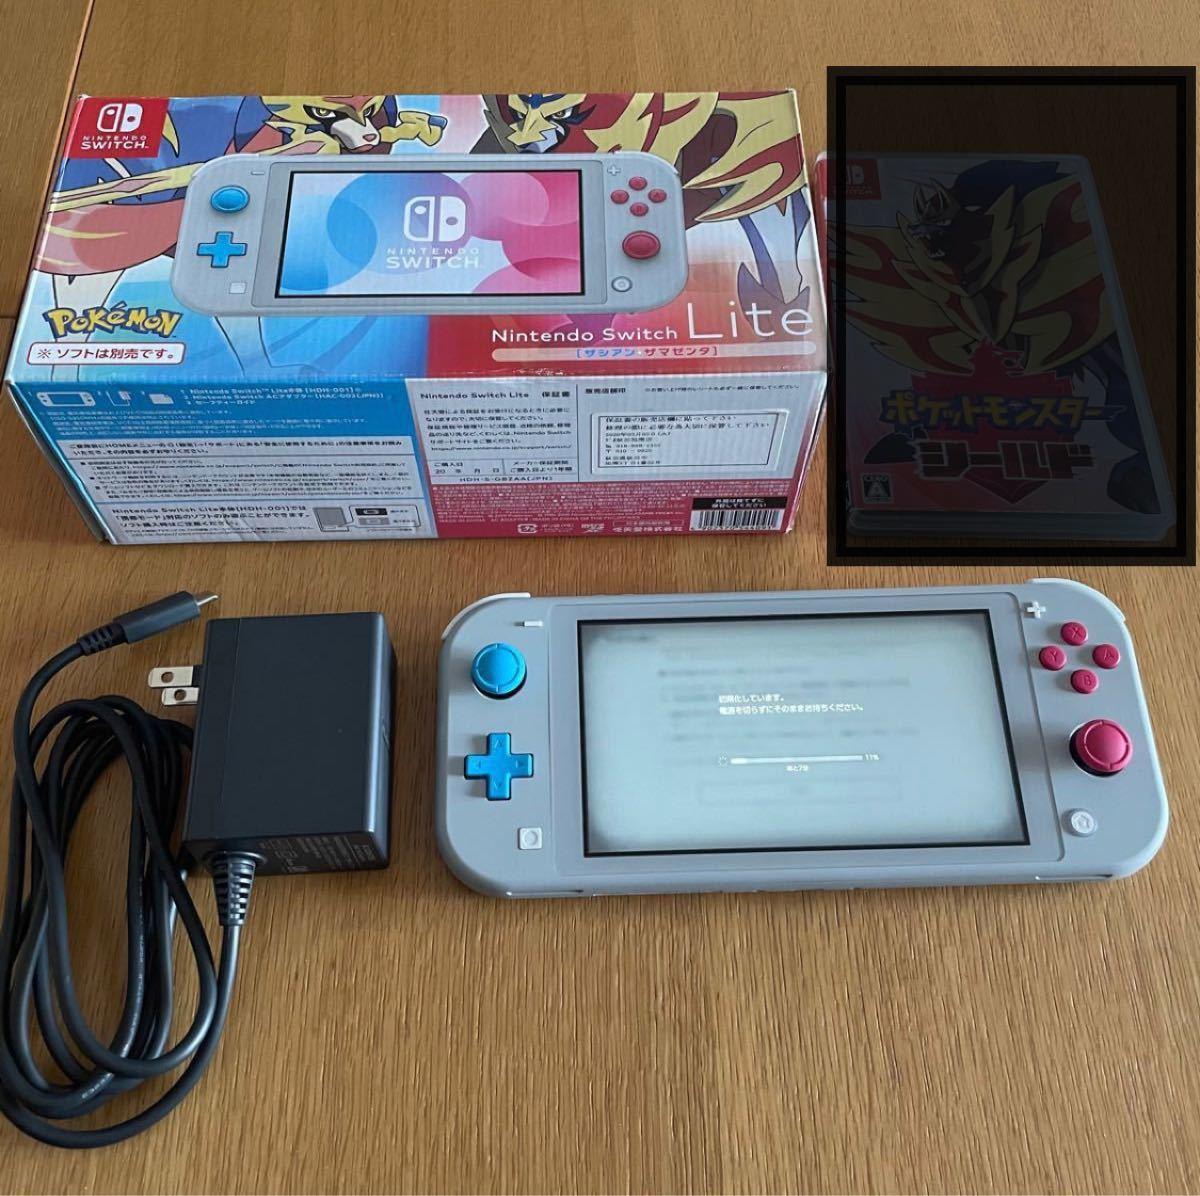 Nintendo Switch lite ニンテンドー スイッチ ライト ザシアン ザマゼンタ ポケモン